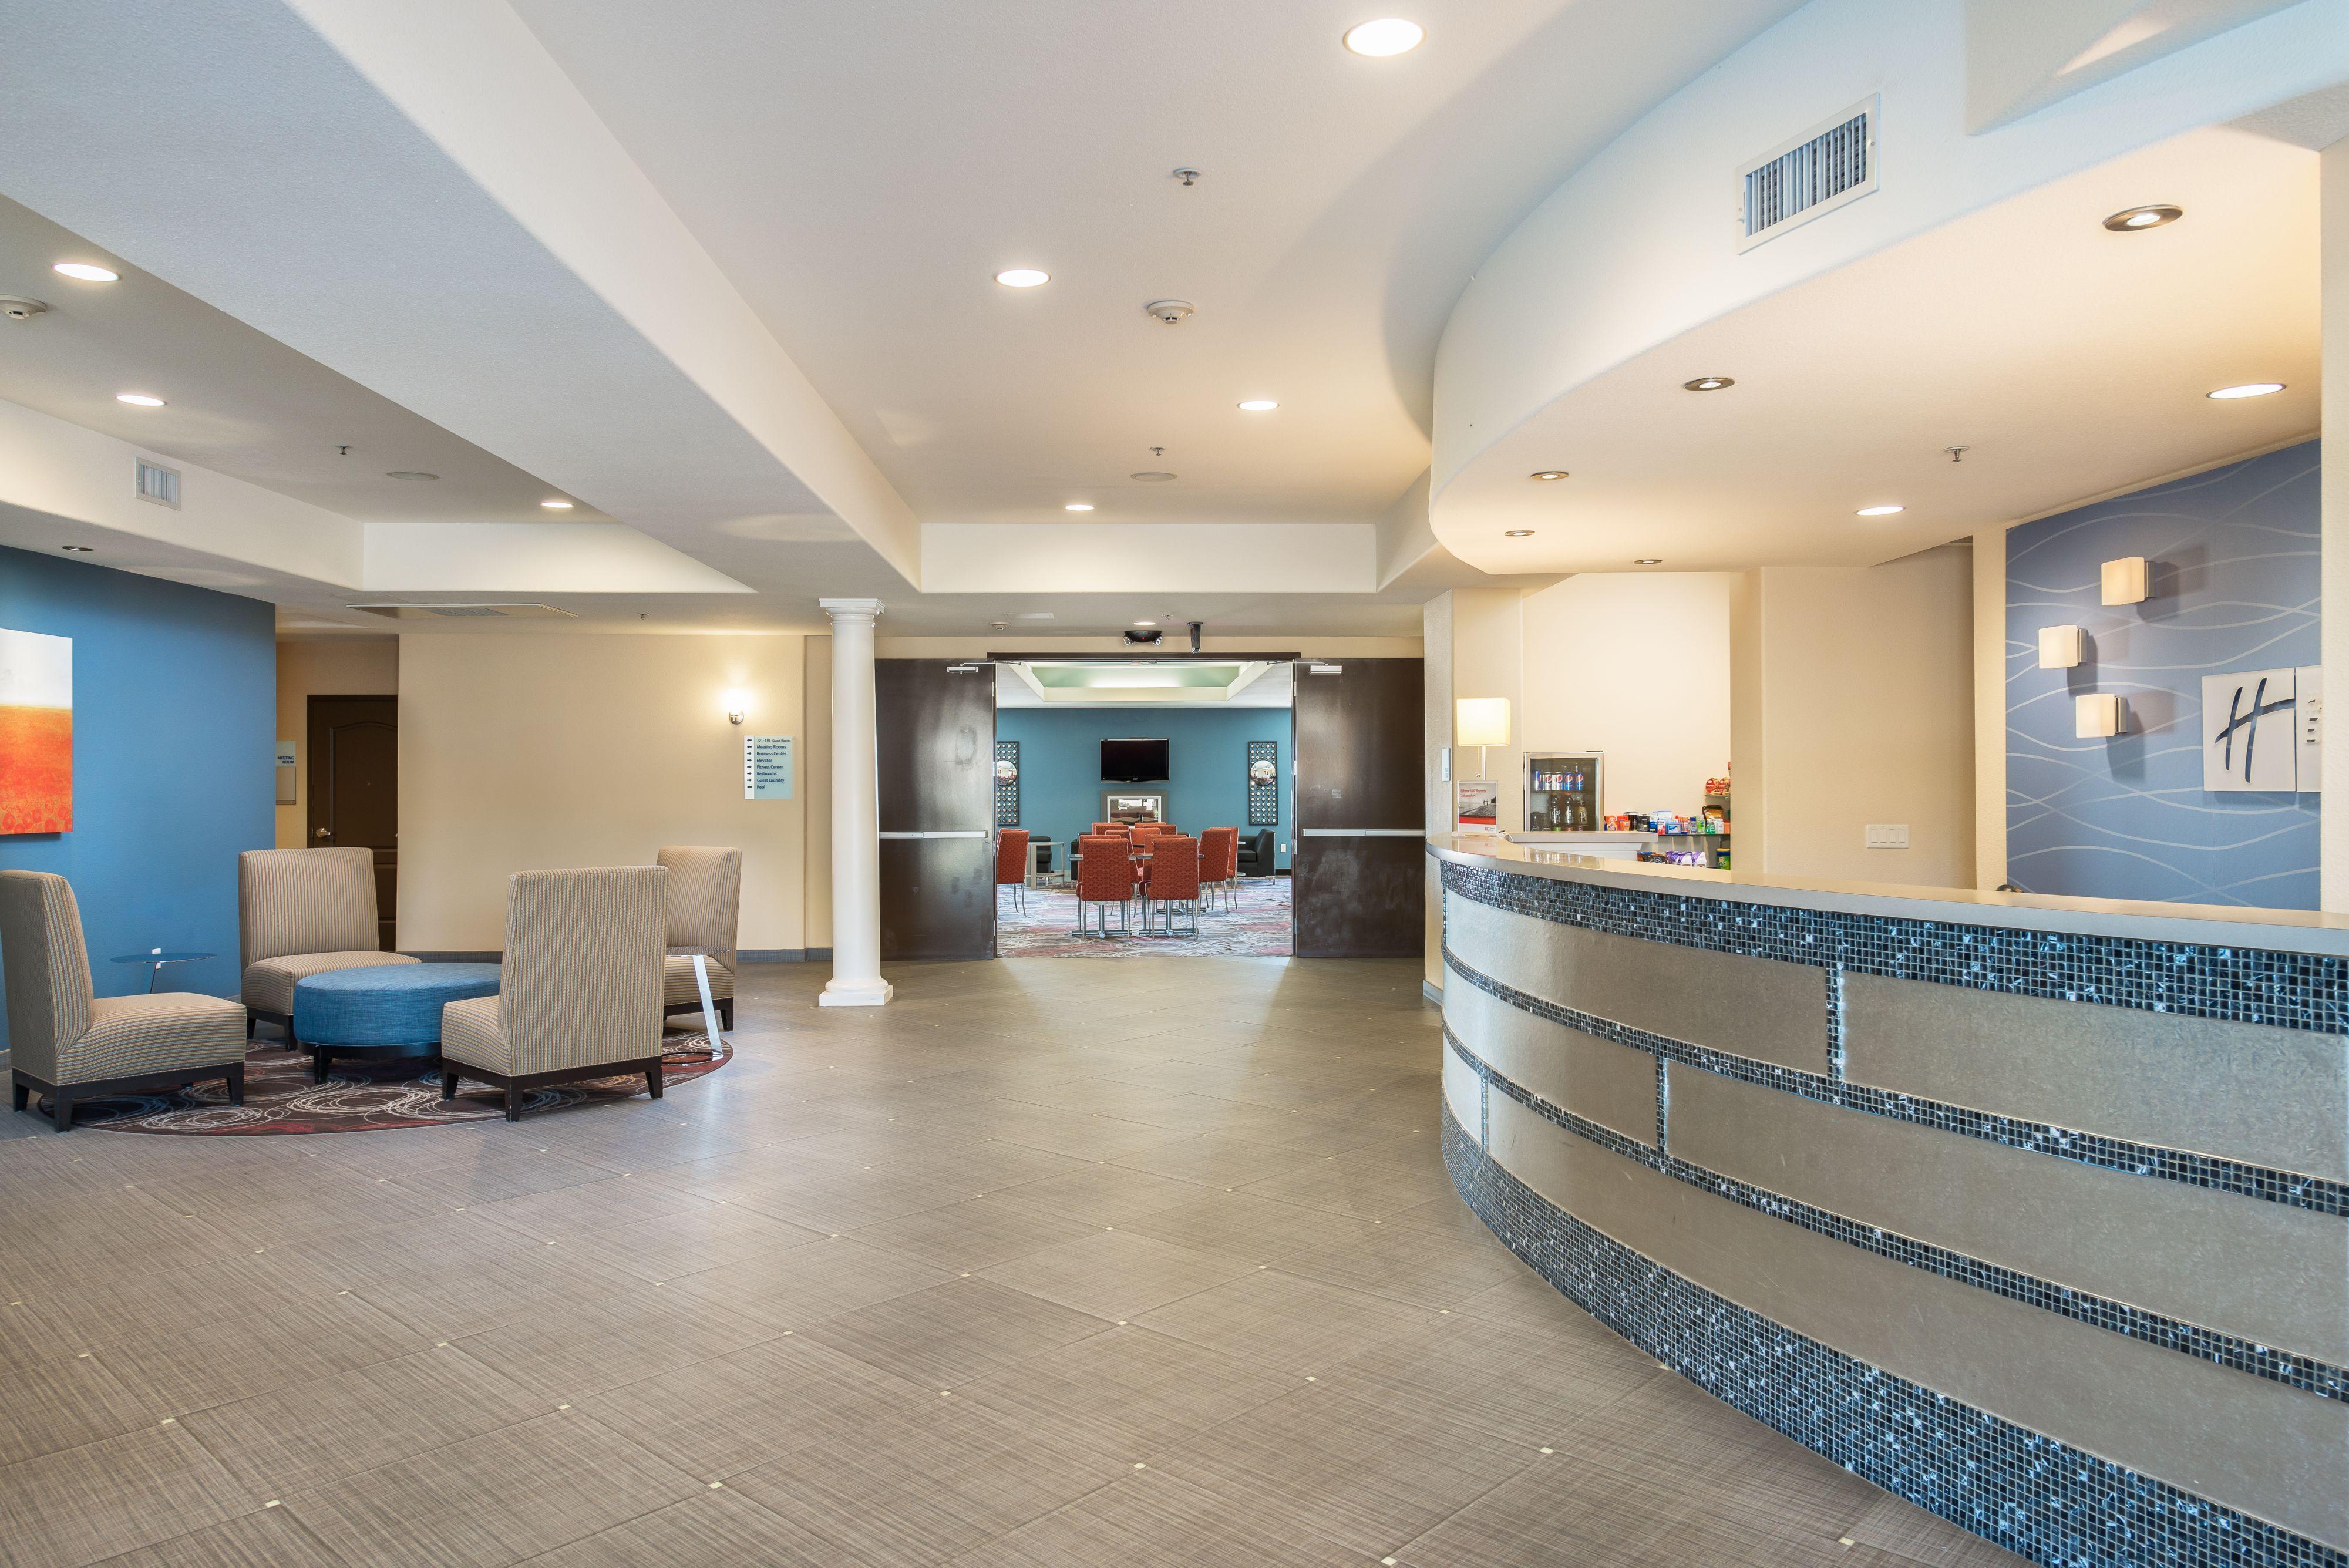 Holiday Inn Express & Suites Chowchilla - Yosemite Pk Area image 4